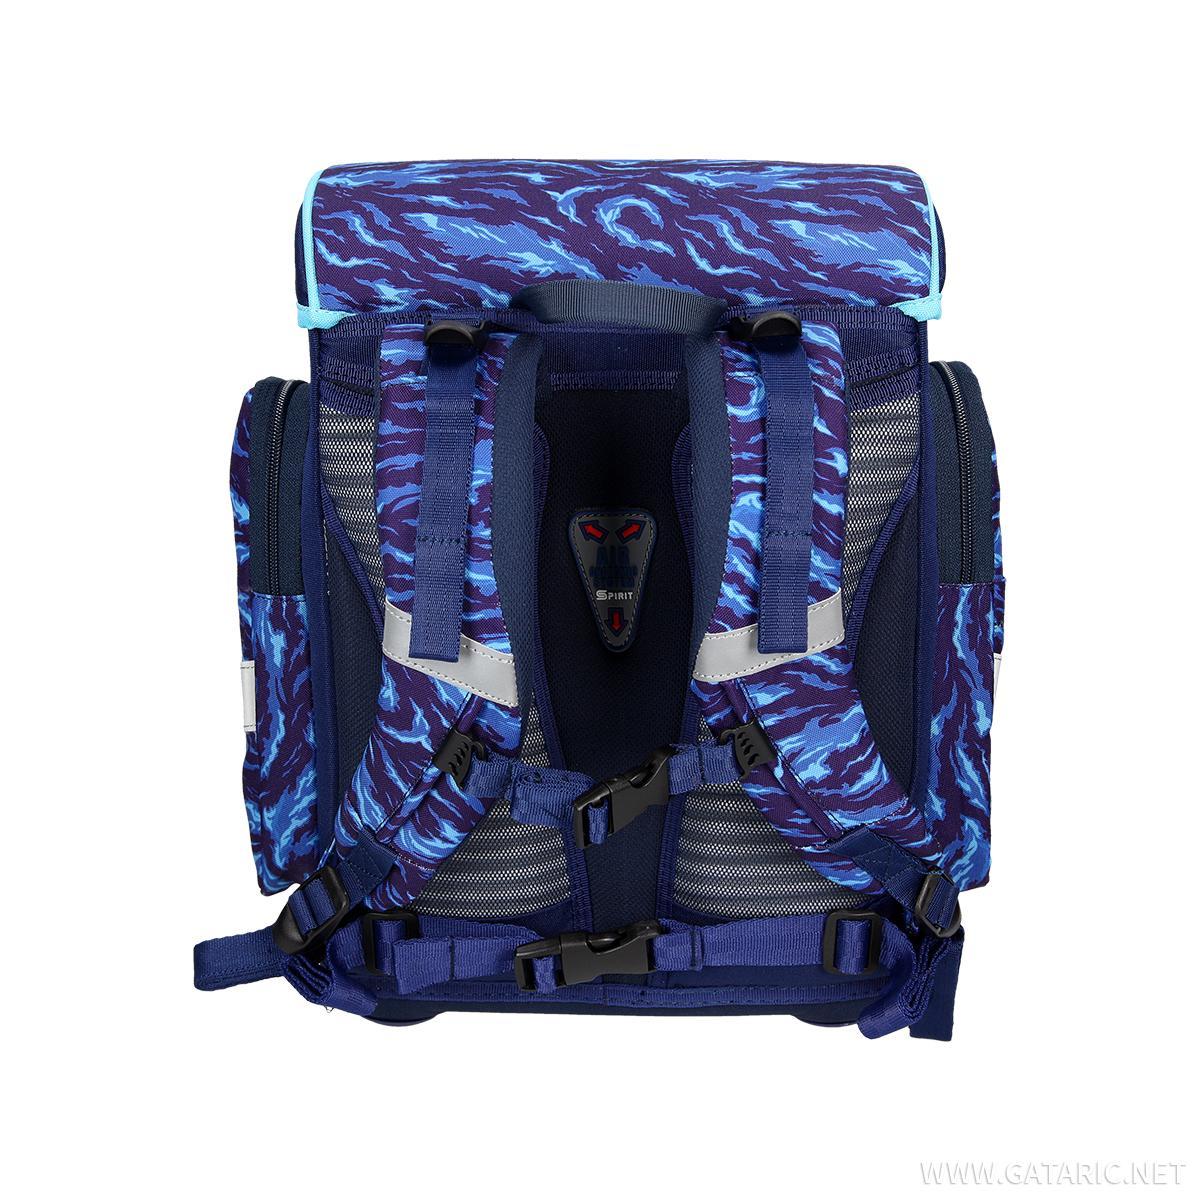 School bag set ''COSMO 06'', LED lock buckle